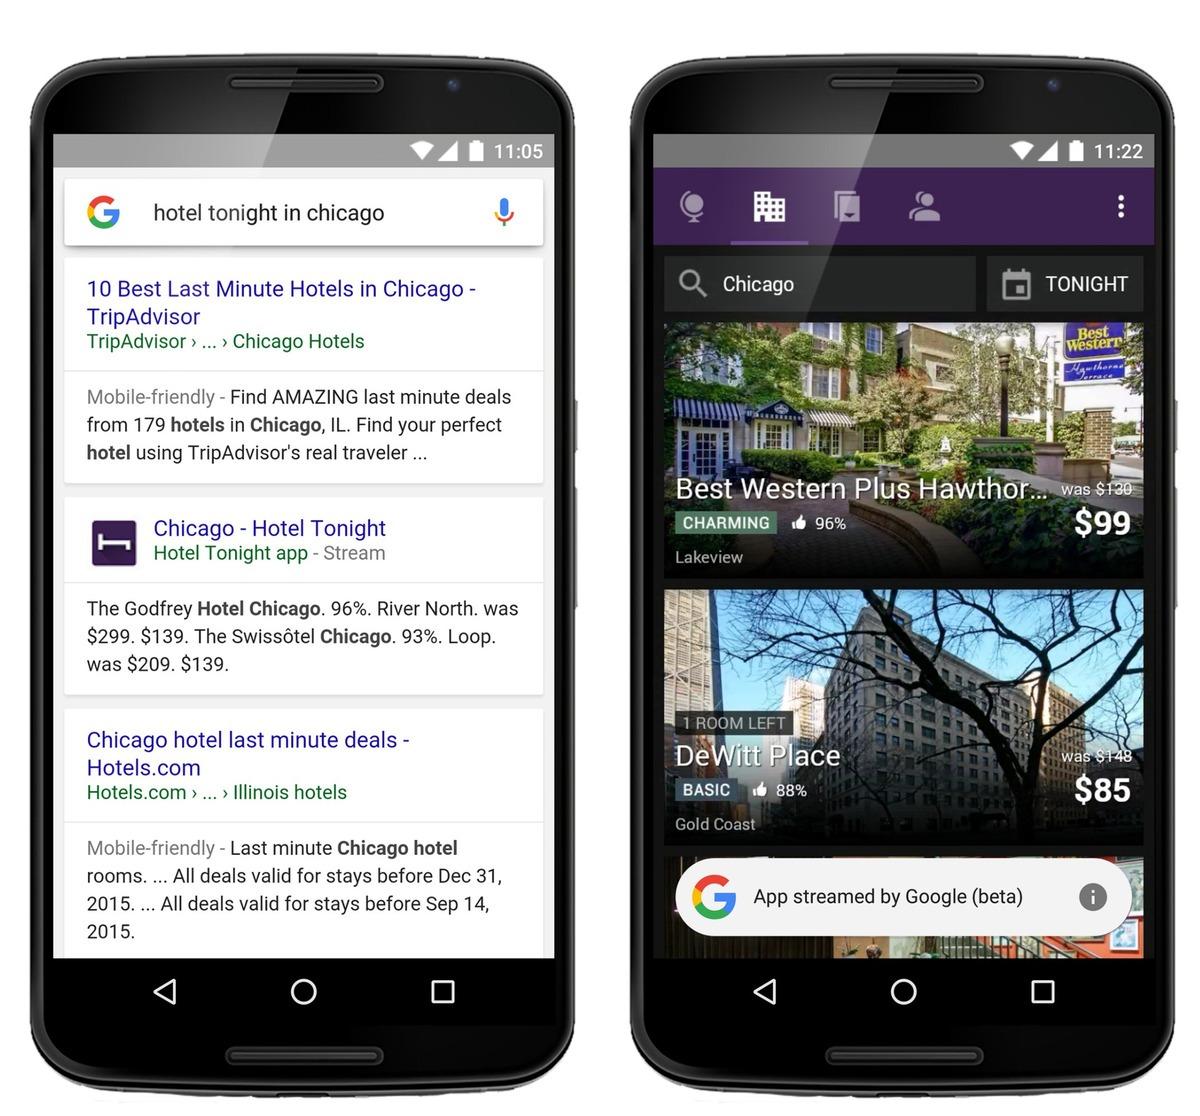 google-app-streaming